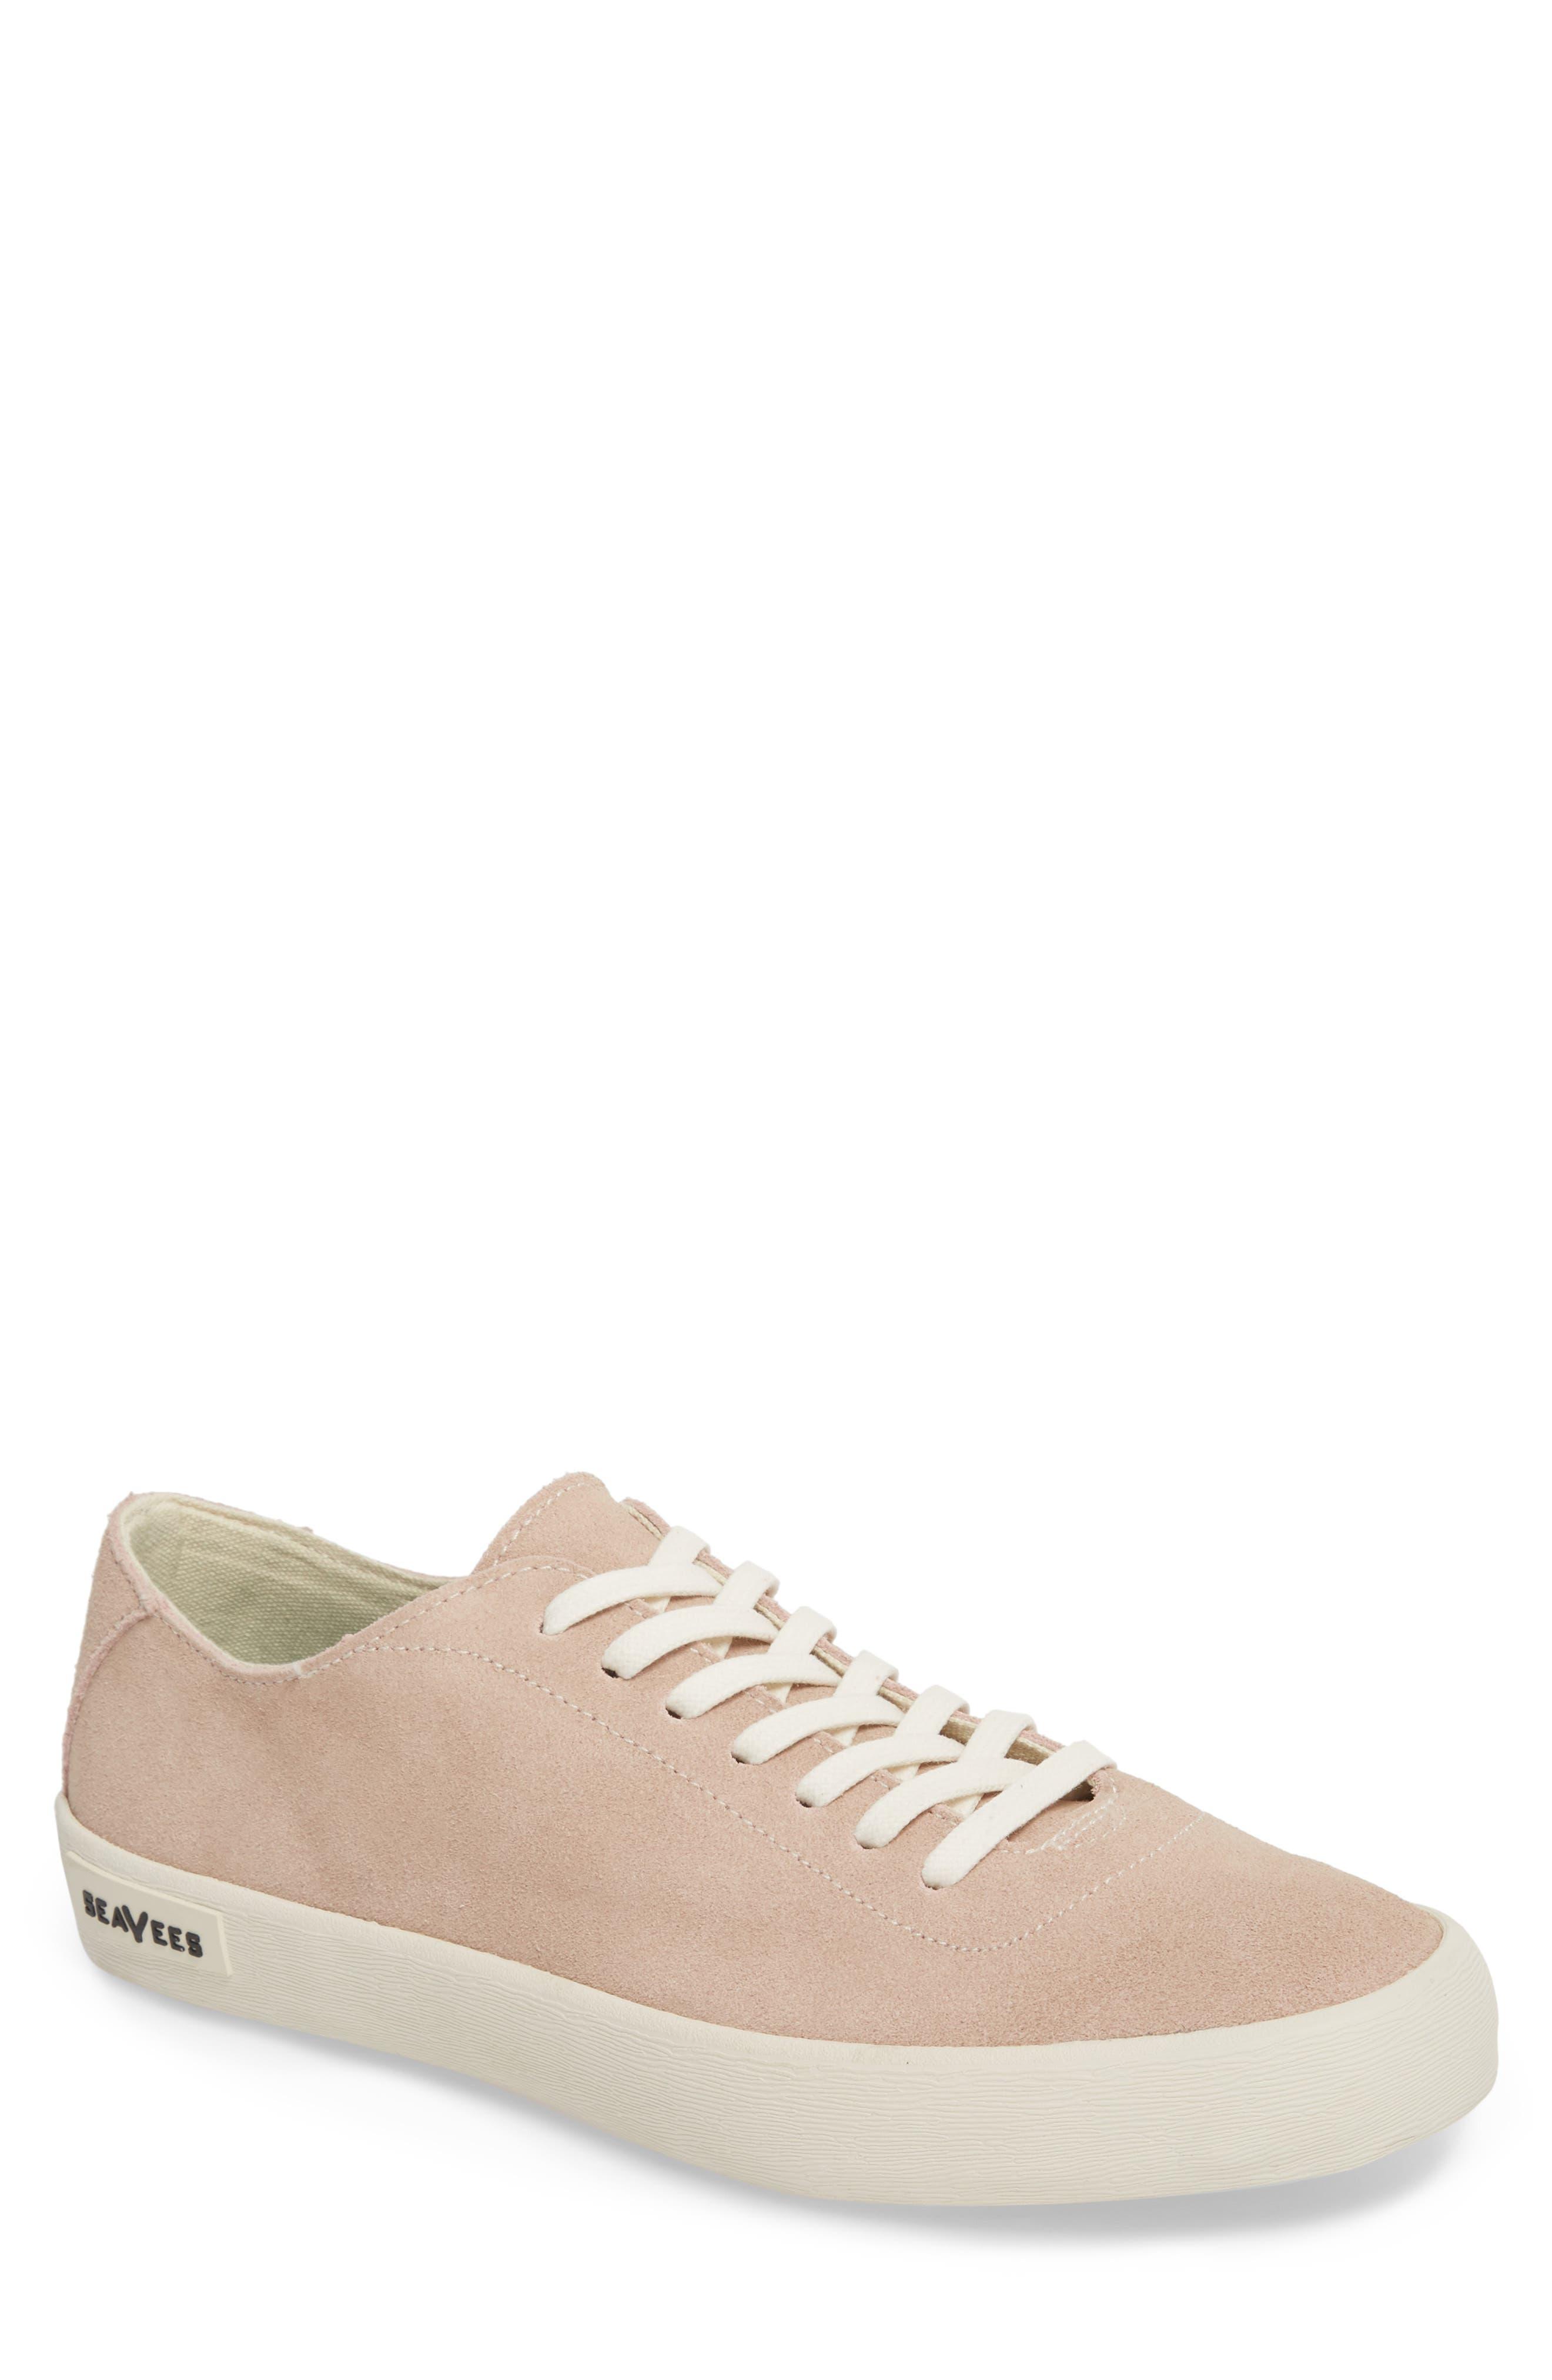 Alternate Image 1 Selected - SeaVees Racquet Club Sneaker (Men)